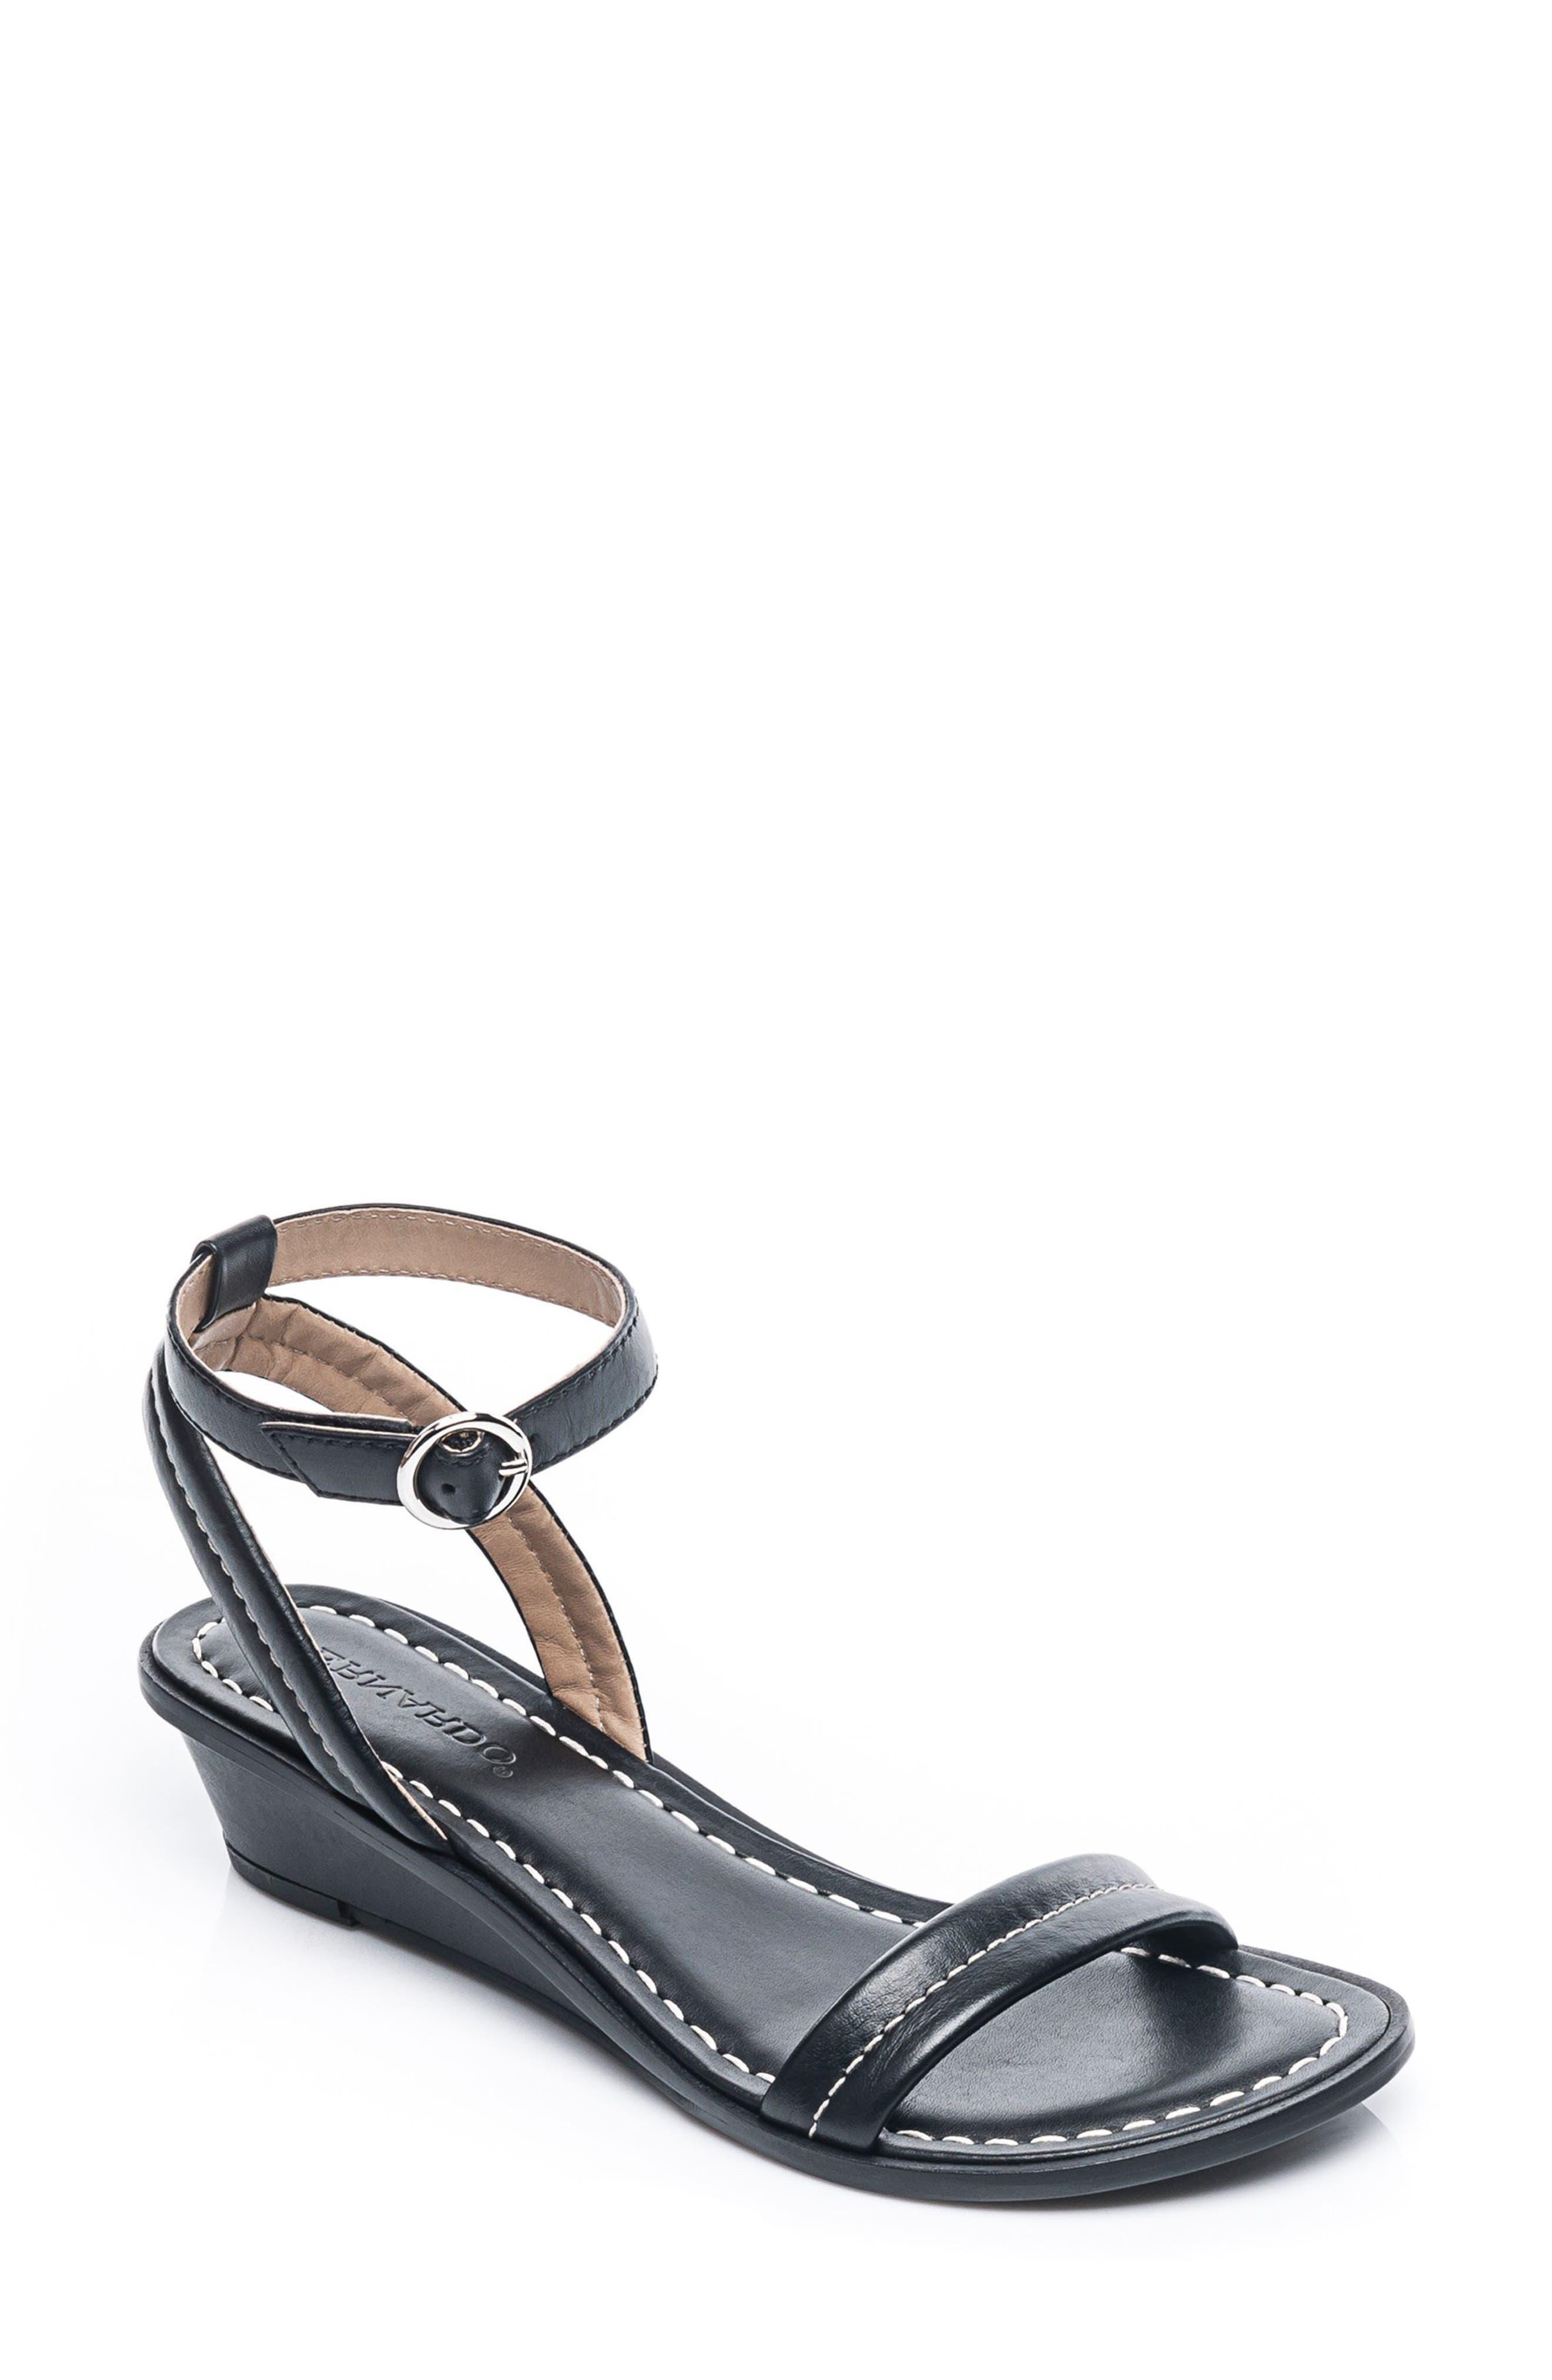 Bernardo Catherine Ankle Strap Sandal,                         Main,                         color, Black Antique